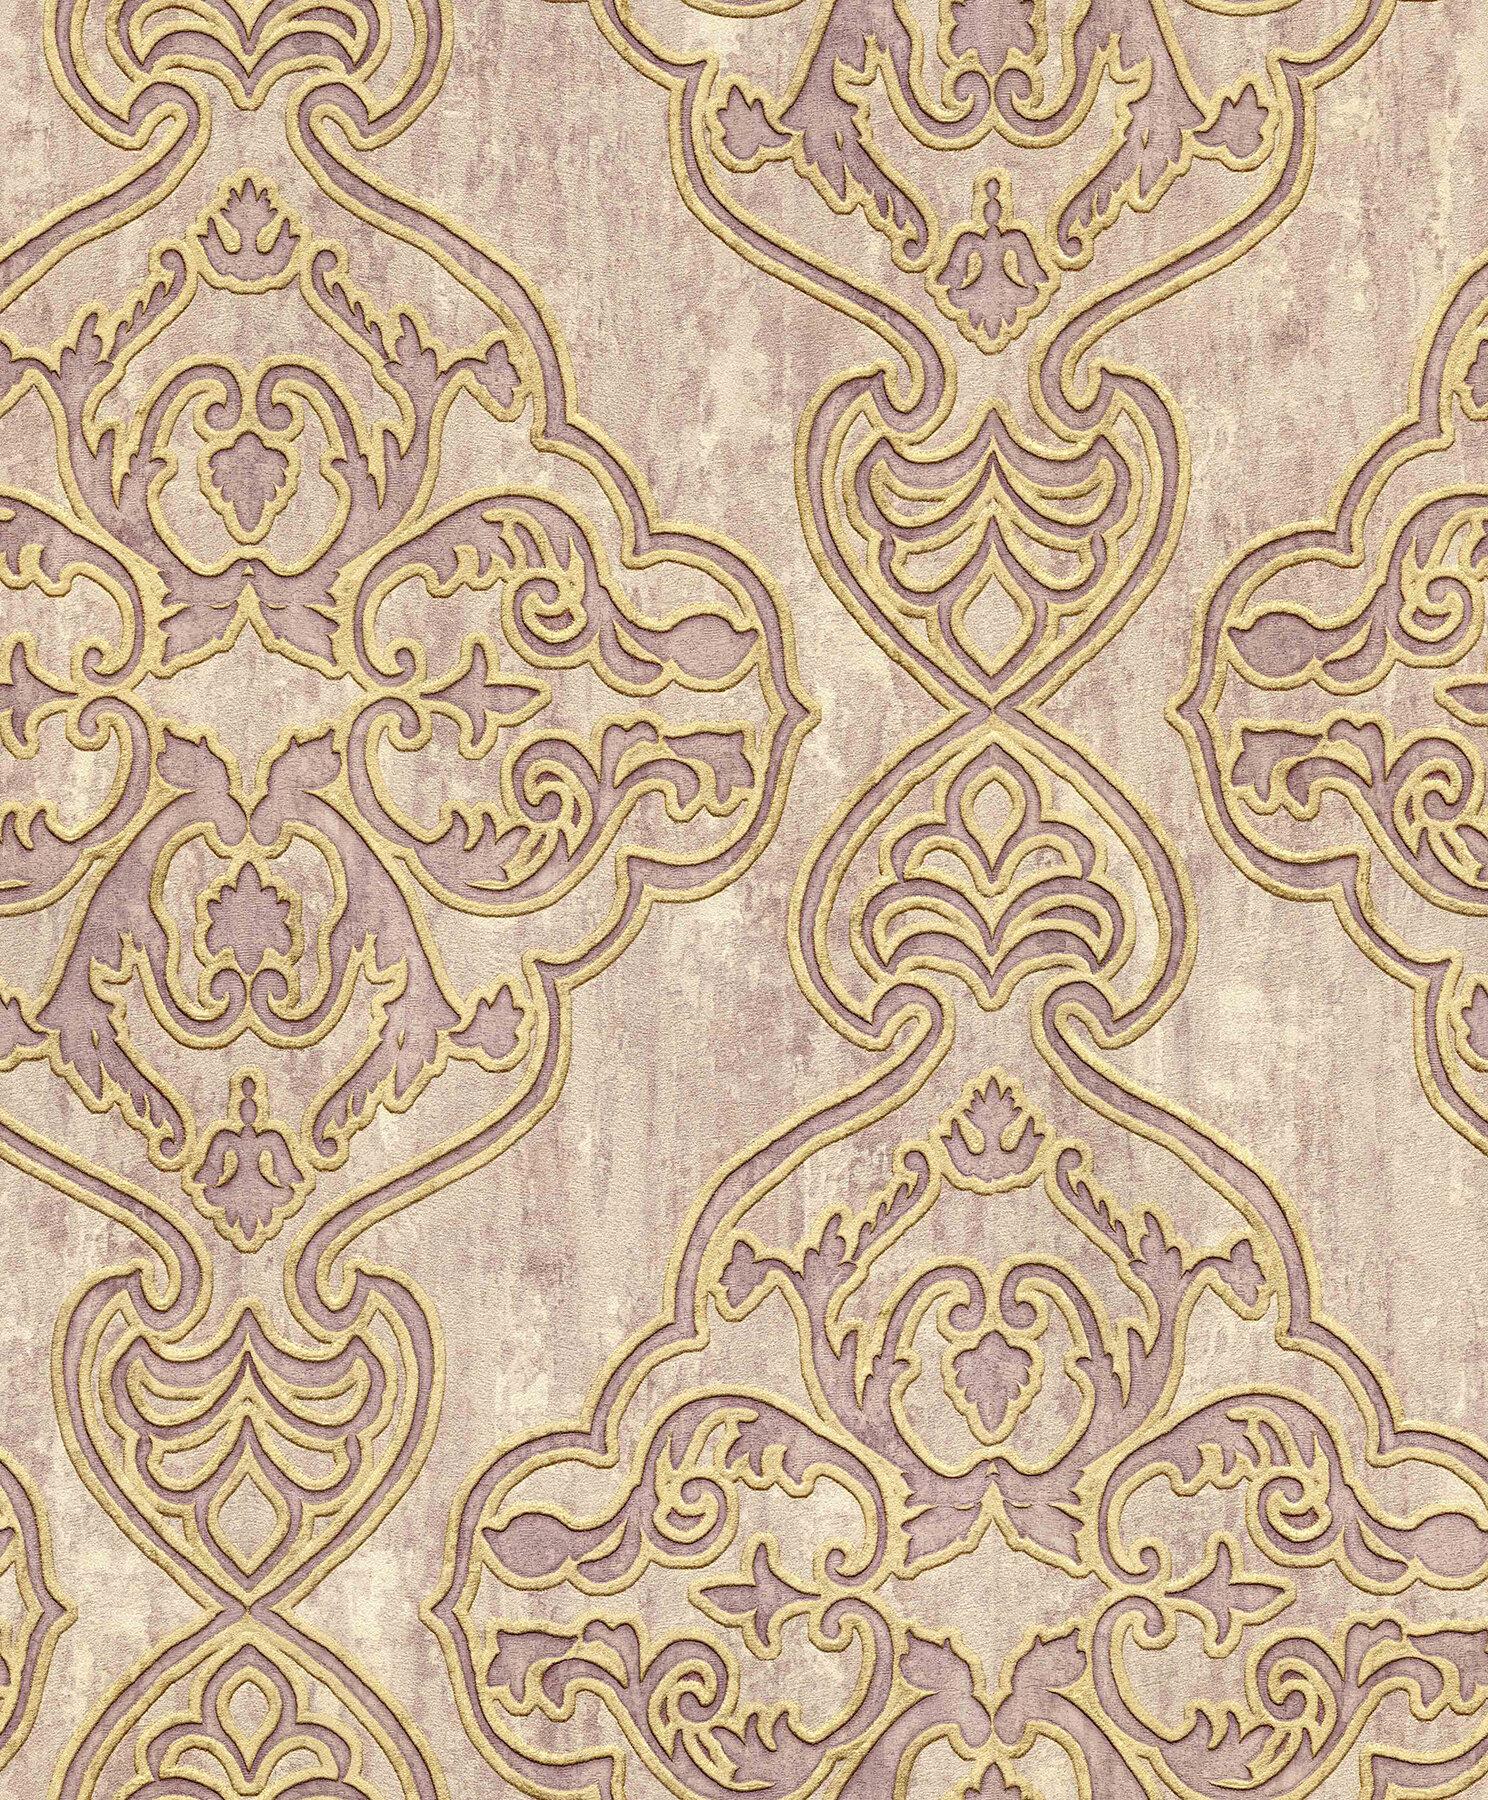 Lindholm 33 L X 20 5 W Damask Wallpaper Roll